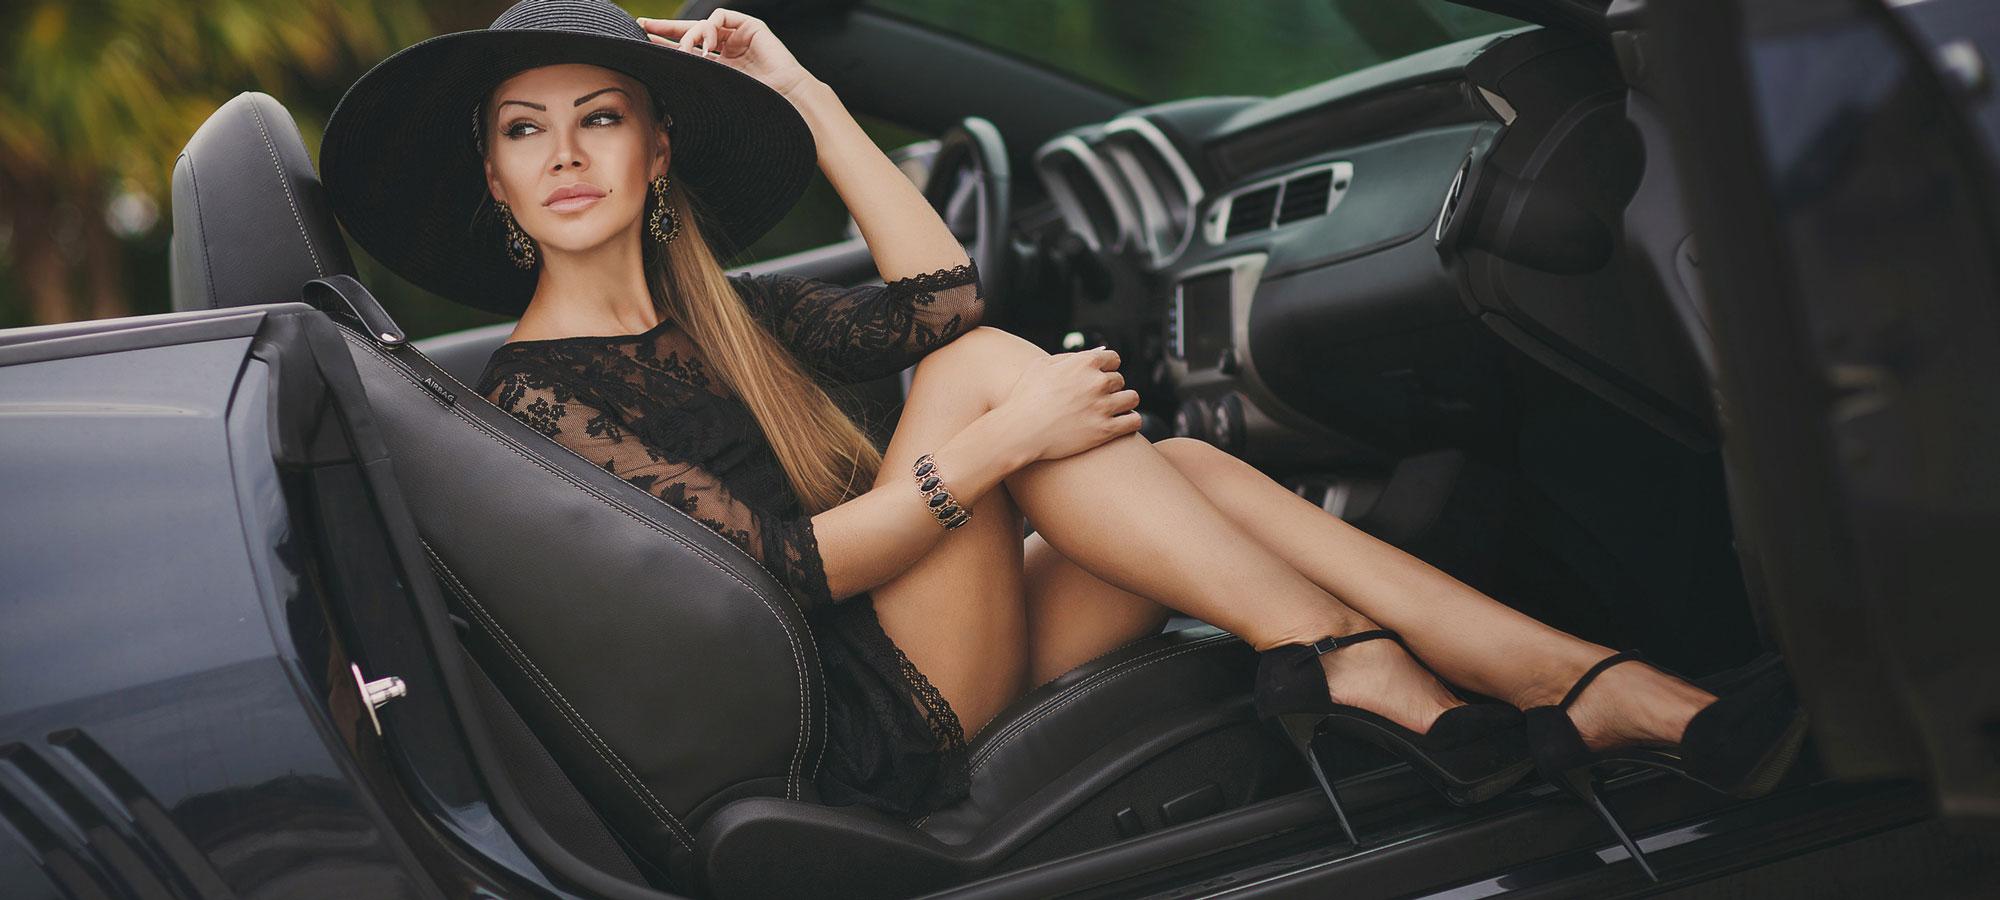 car_woman